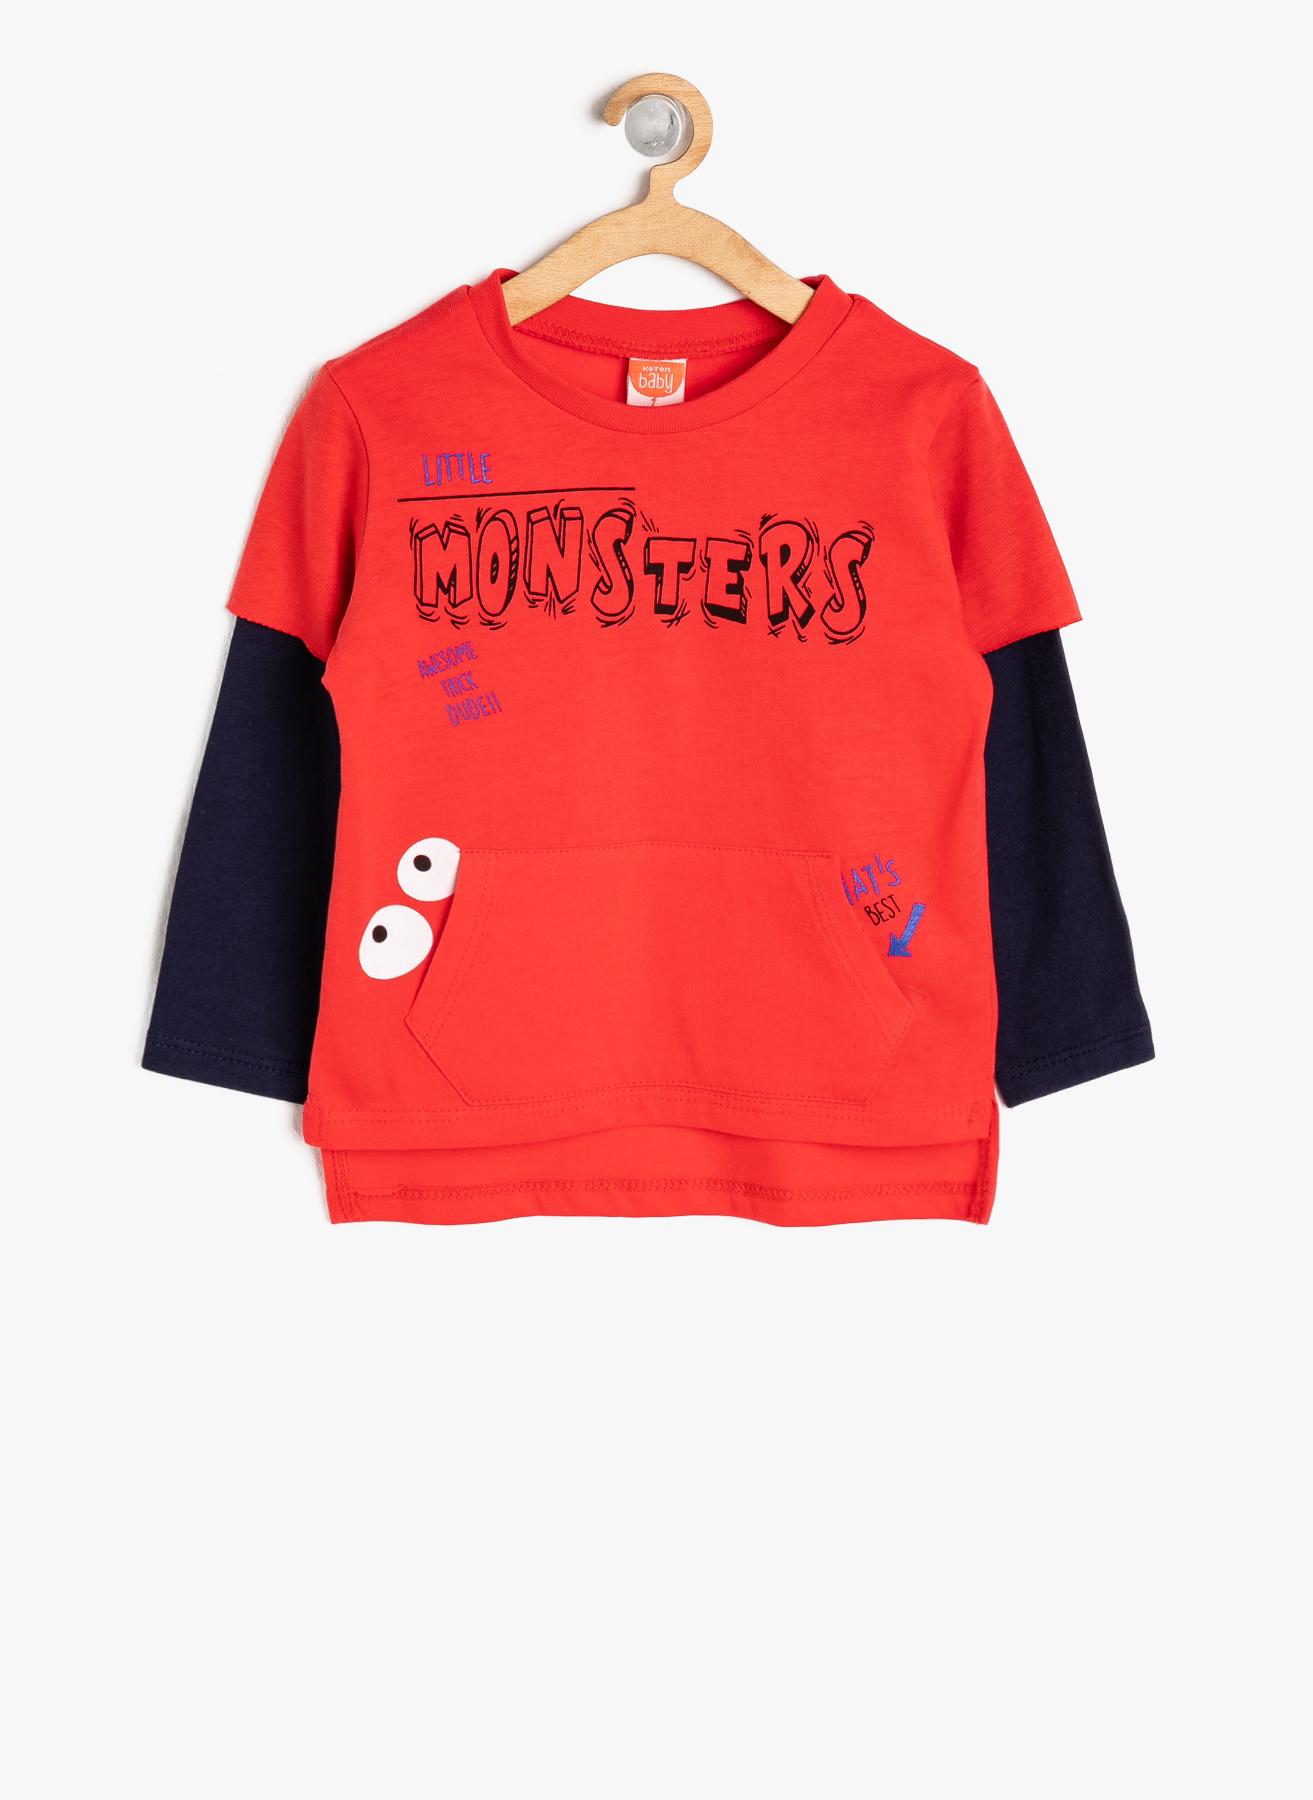 Koton Kırmızı T-Shirt 24 Ay 5001703361003 Ürün Resmi